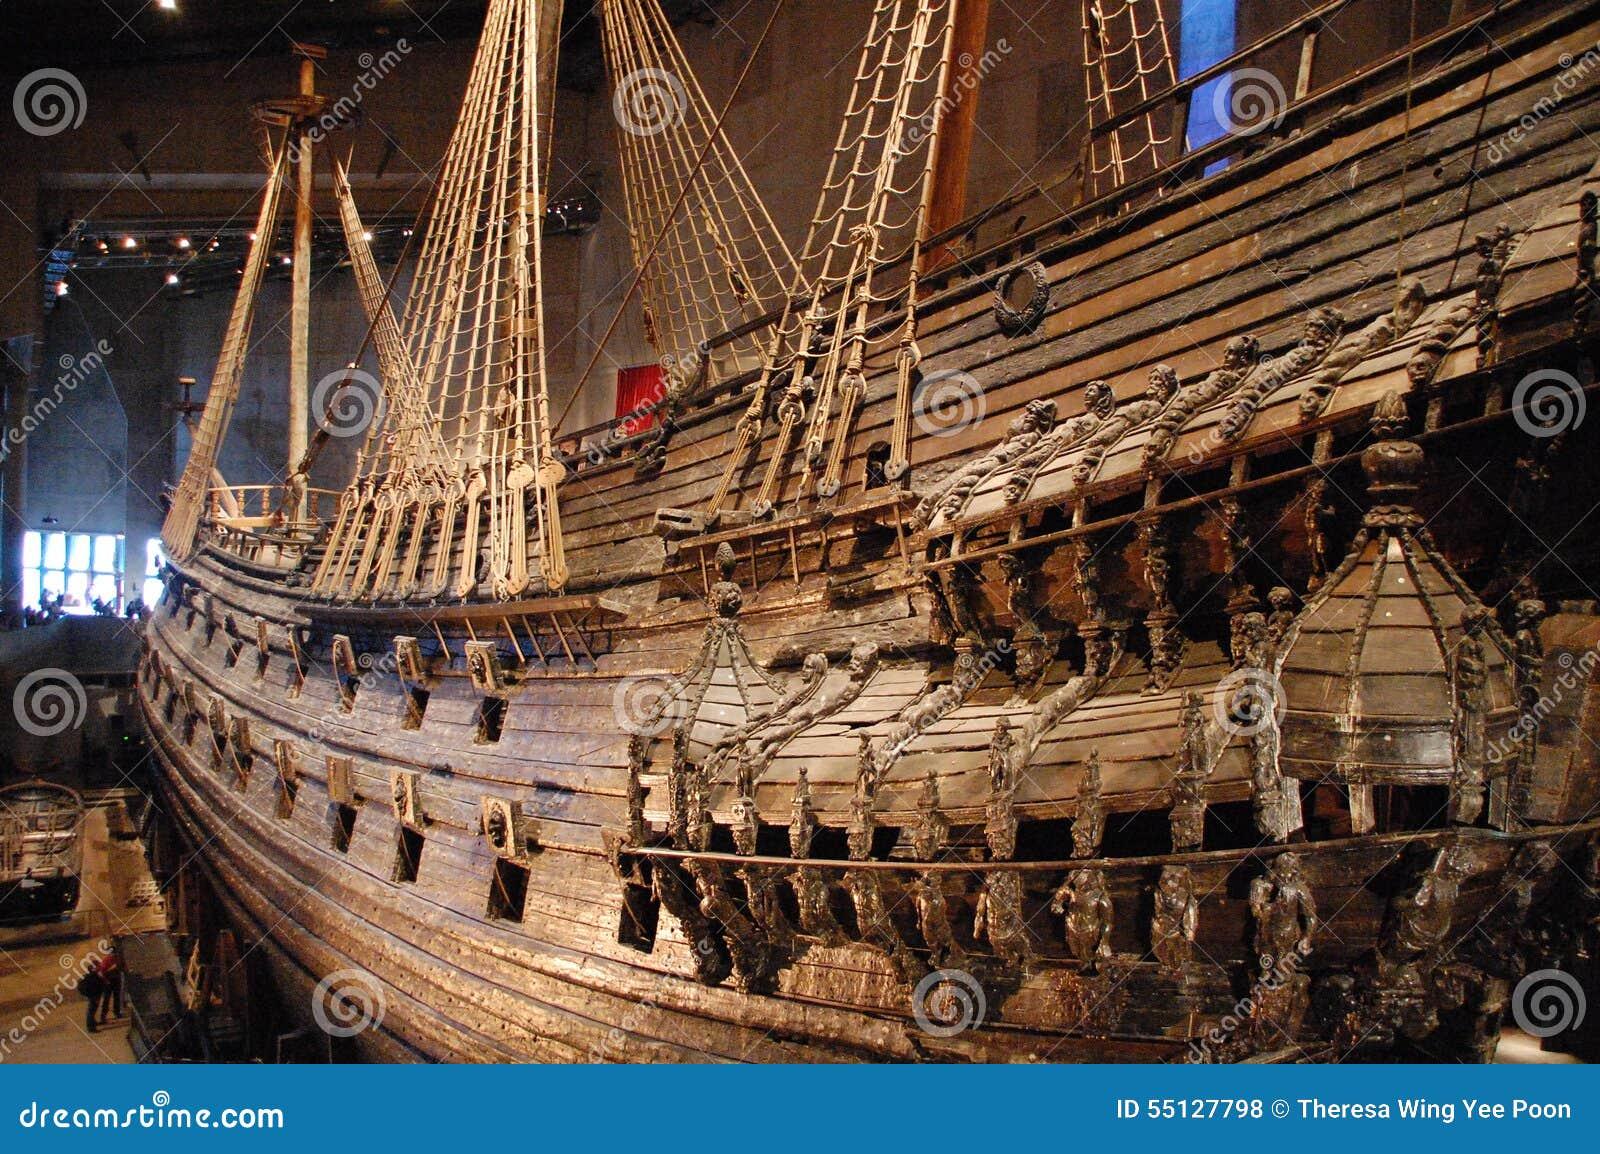 Viking boat in Vasamuseet editorial stock photo. Image of sailing - 55127798